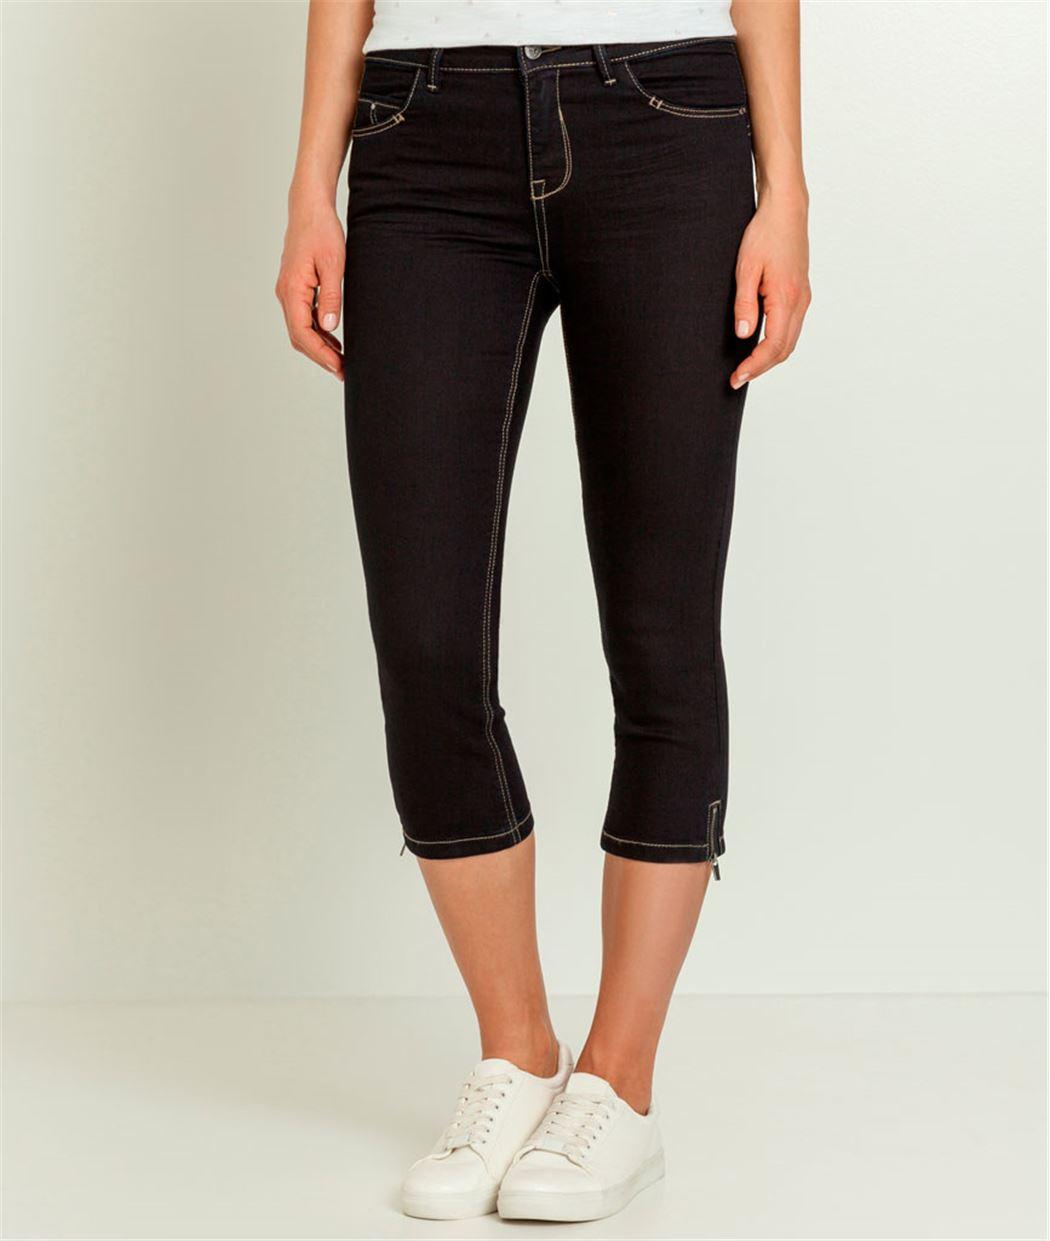 jean femme corsaire zipp blue black grain de malice. Black Bedroom Furniture Sets. Home Design Ideas